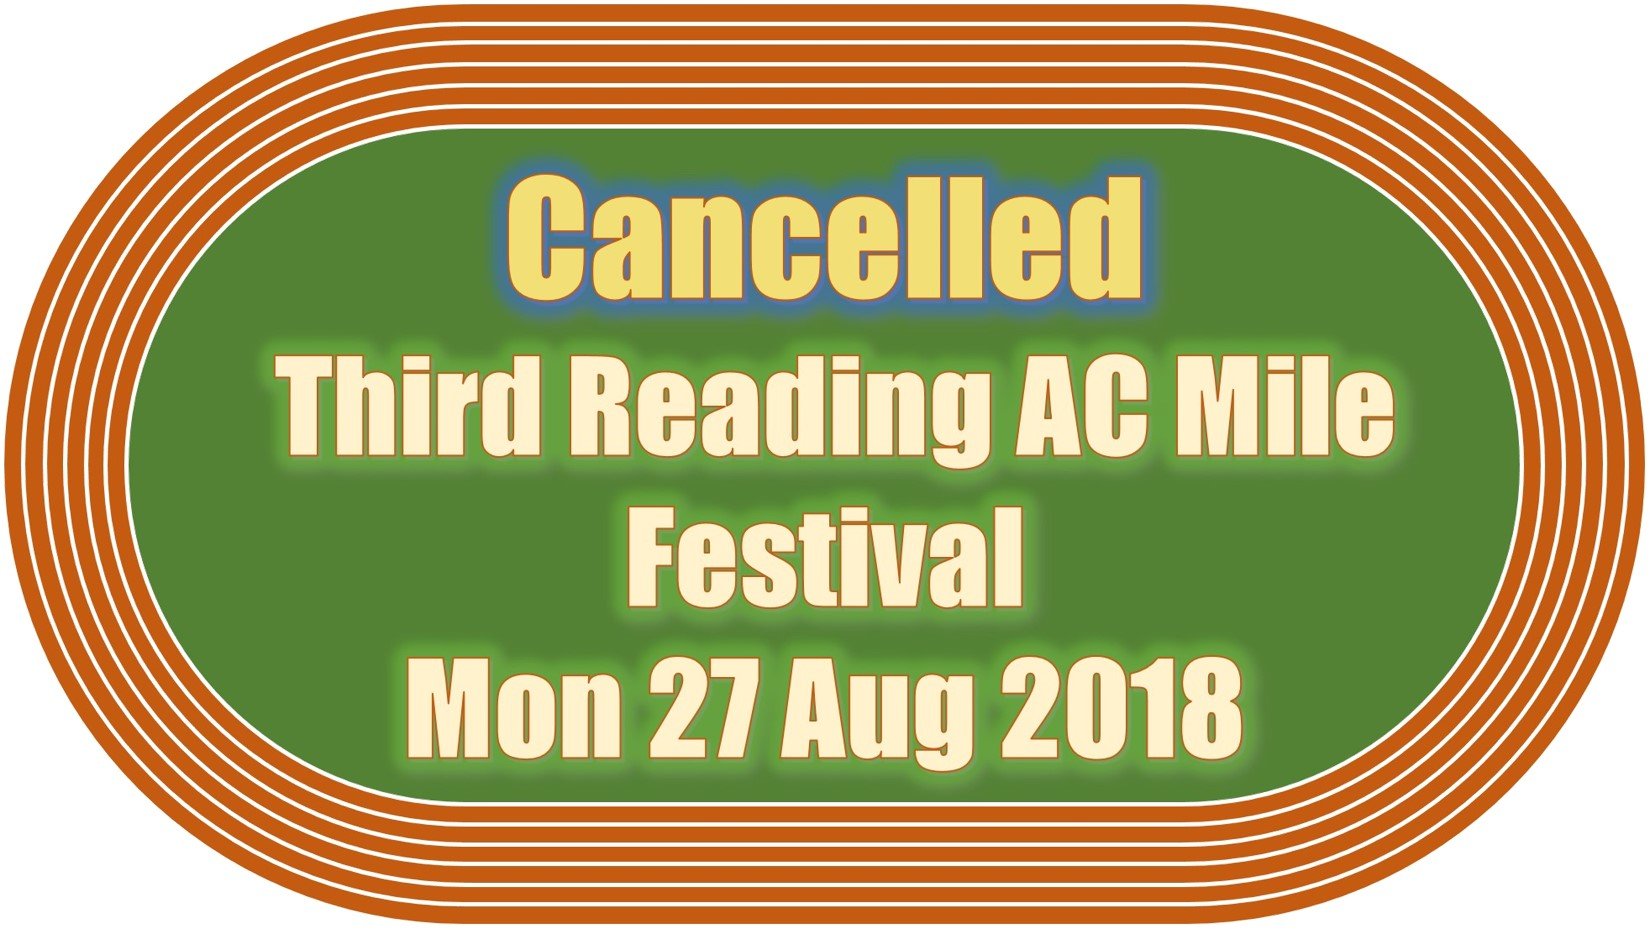 Cancelled Notice.jpg